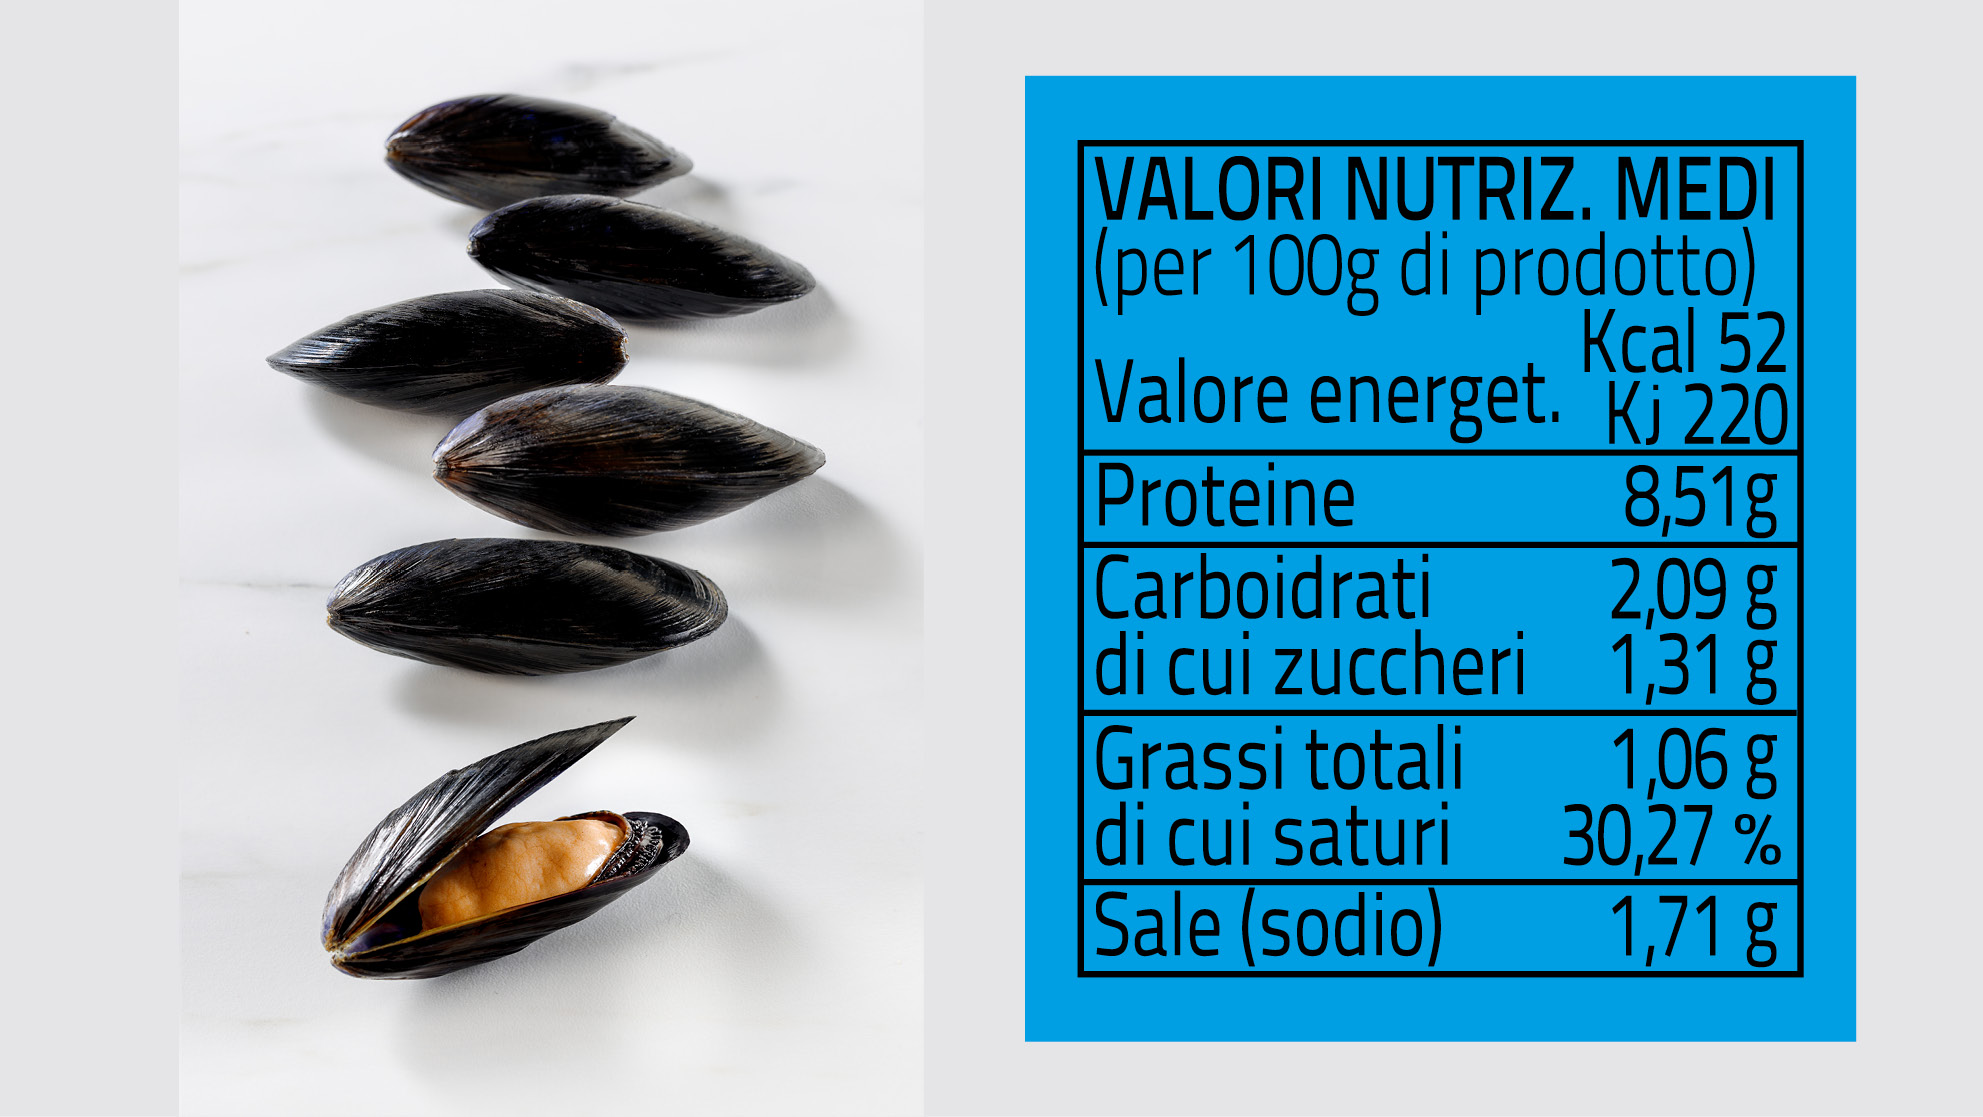 quante calorie fornisce la dieta ipocalorica?